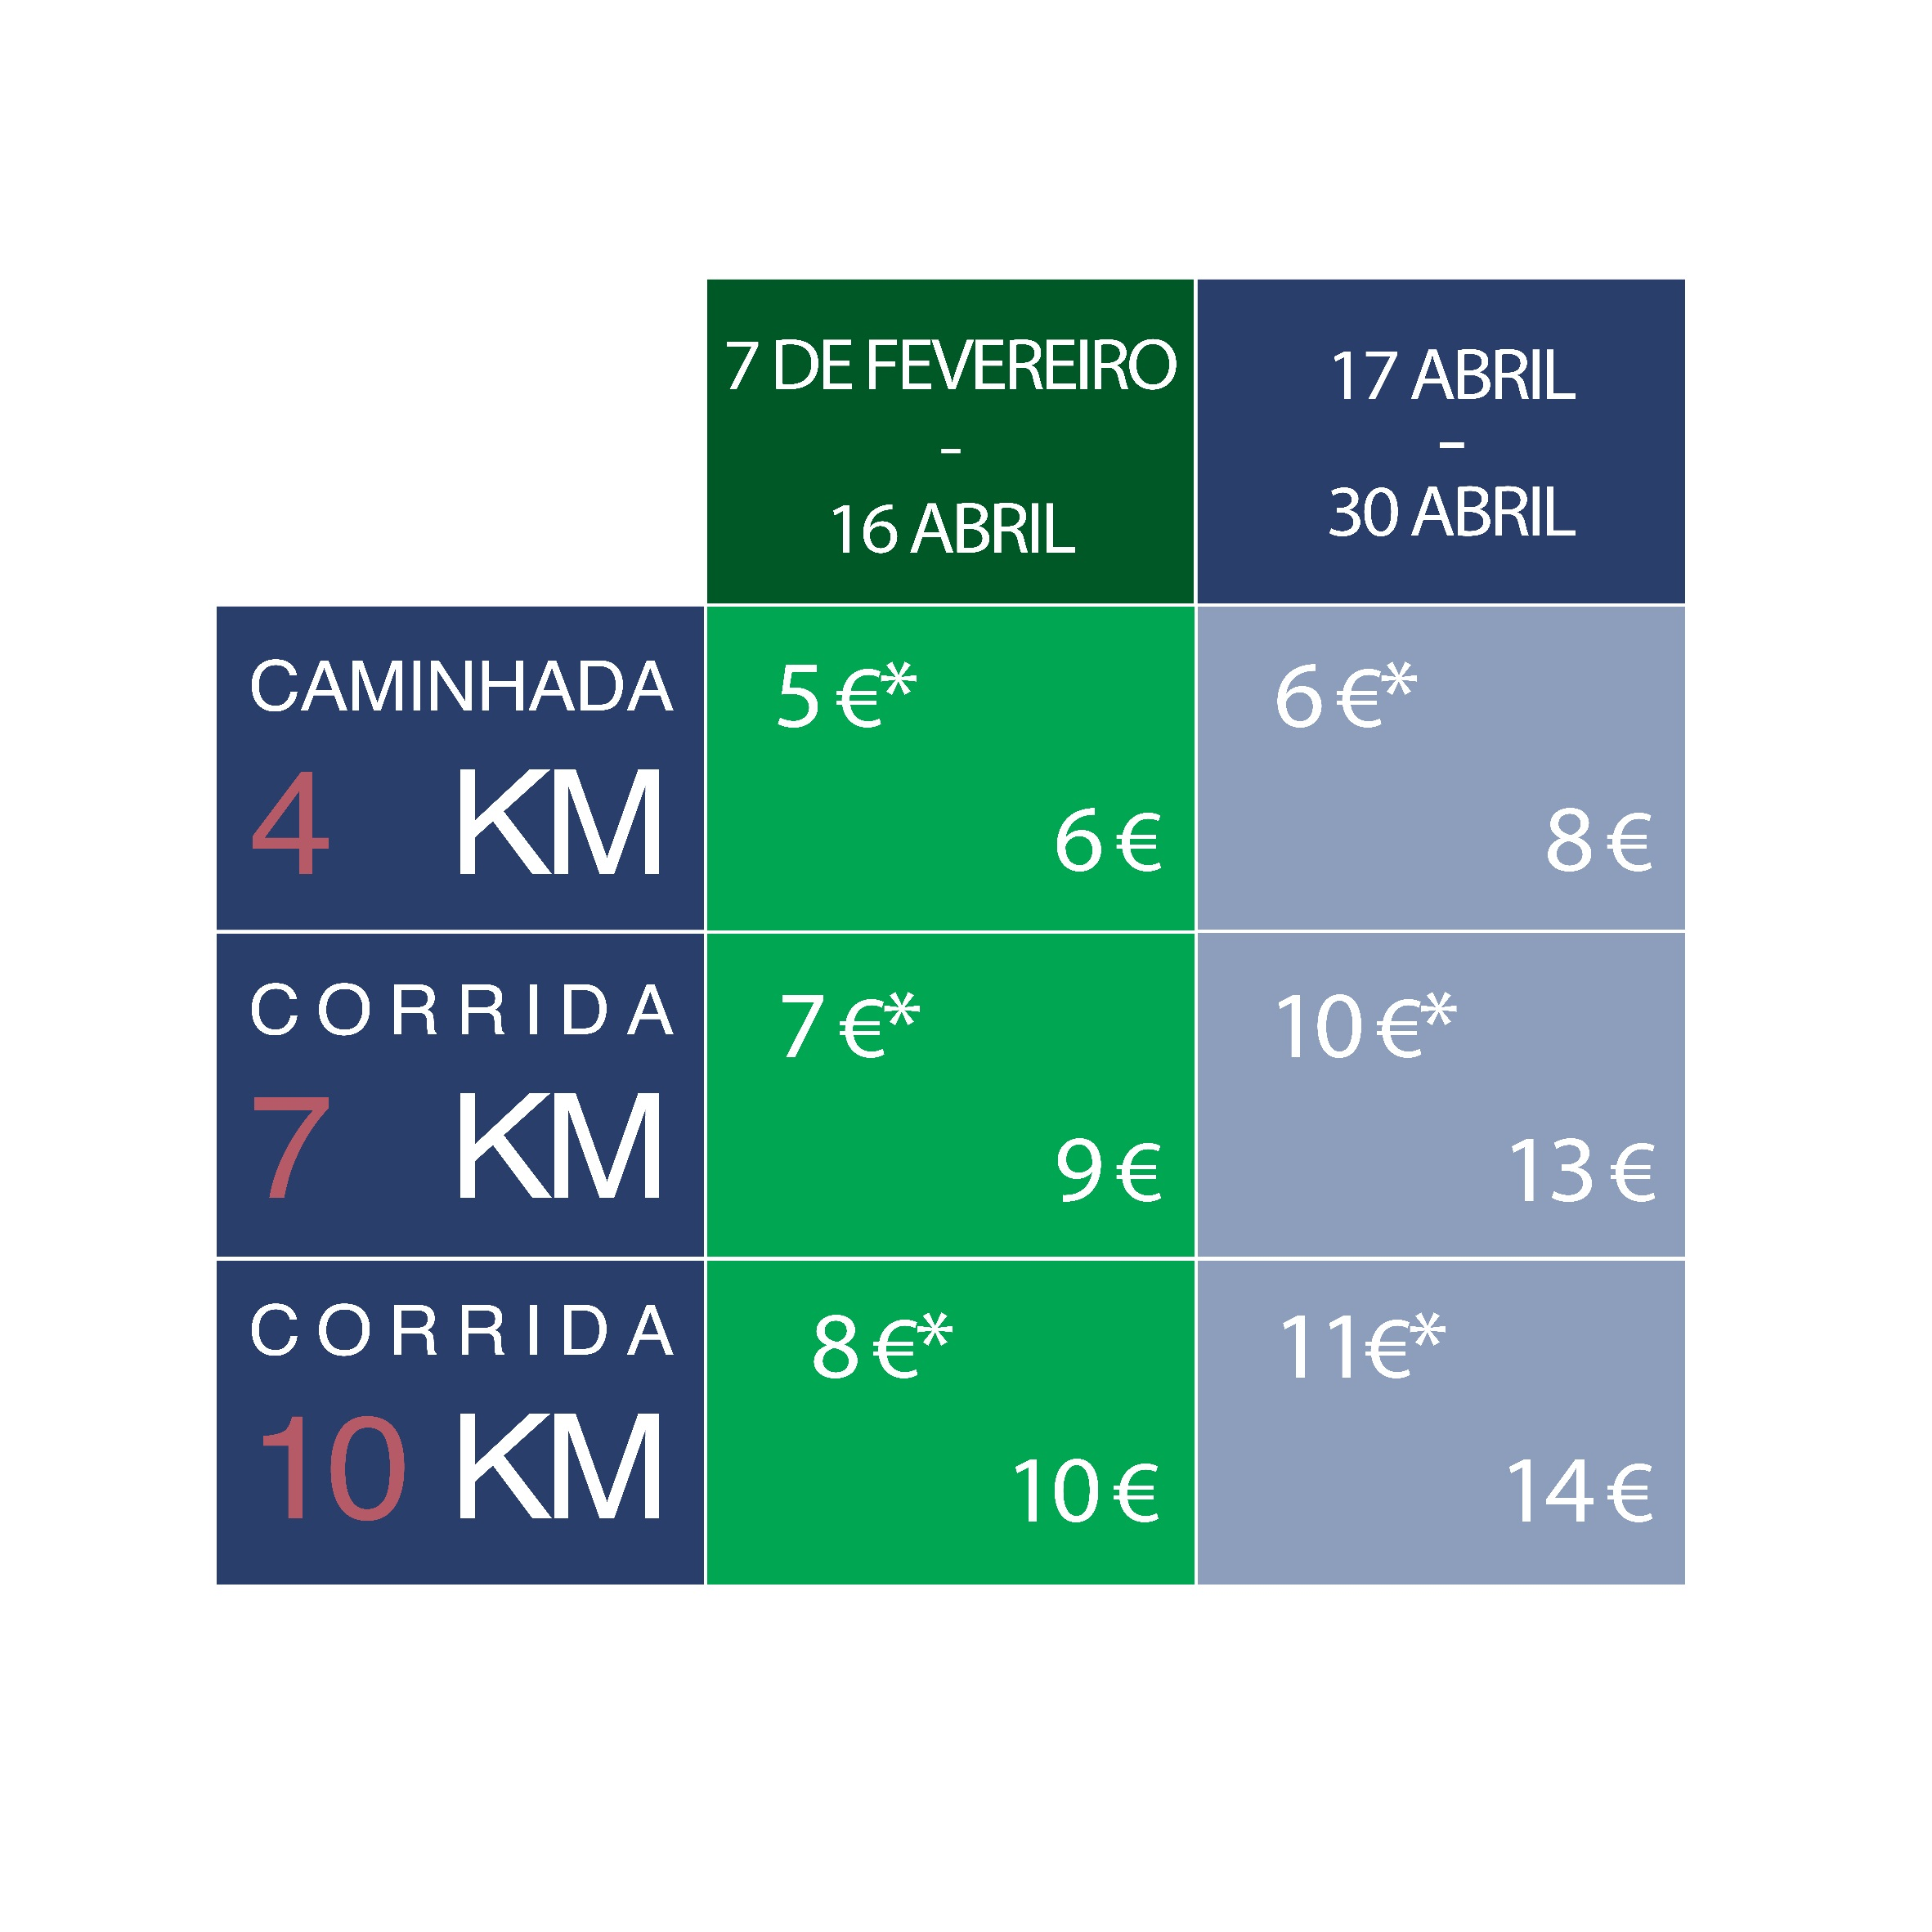 tabela_precos_corrida+saude